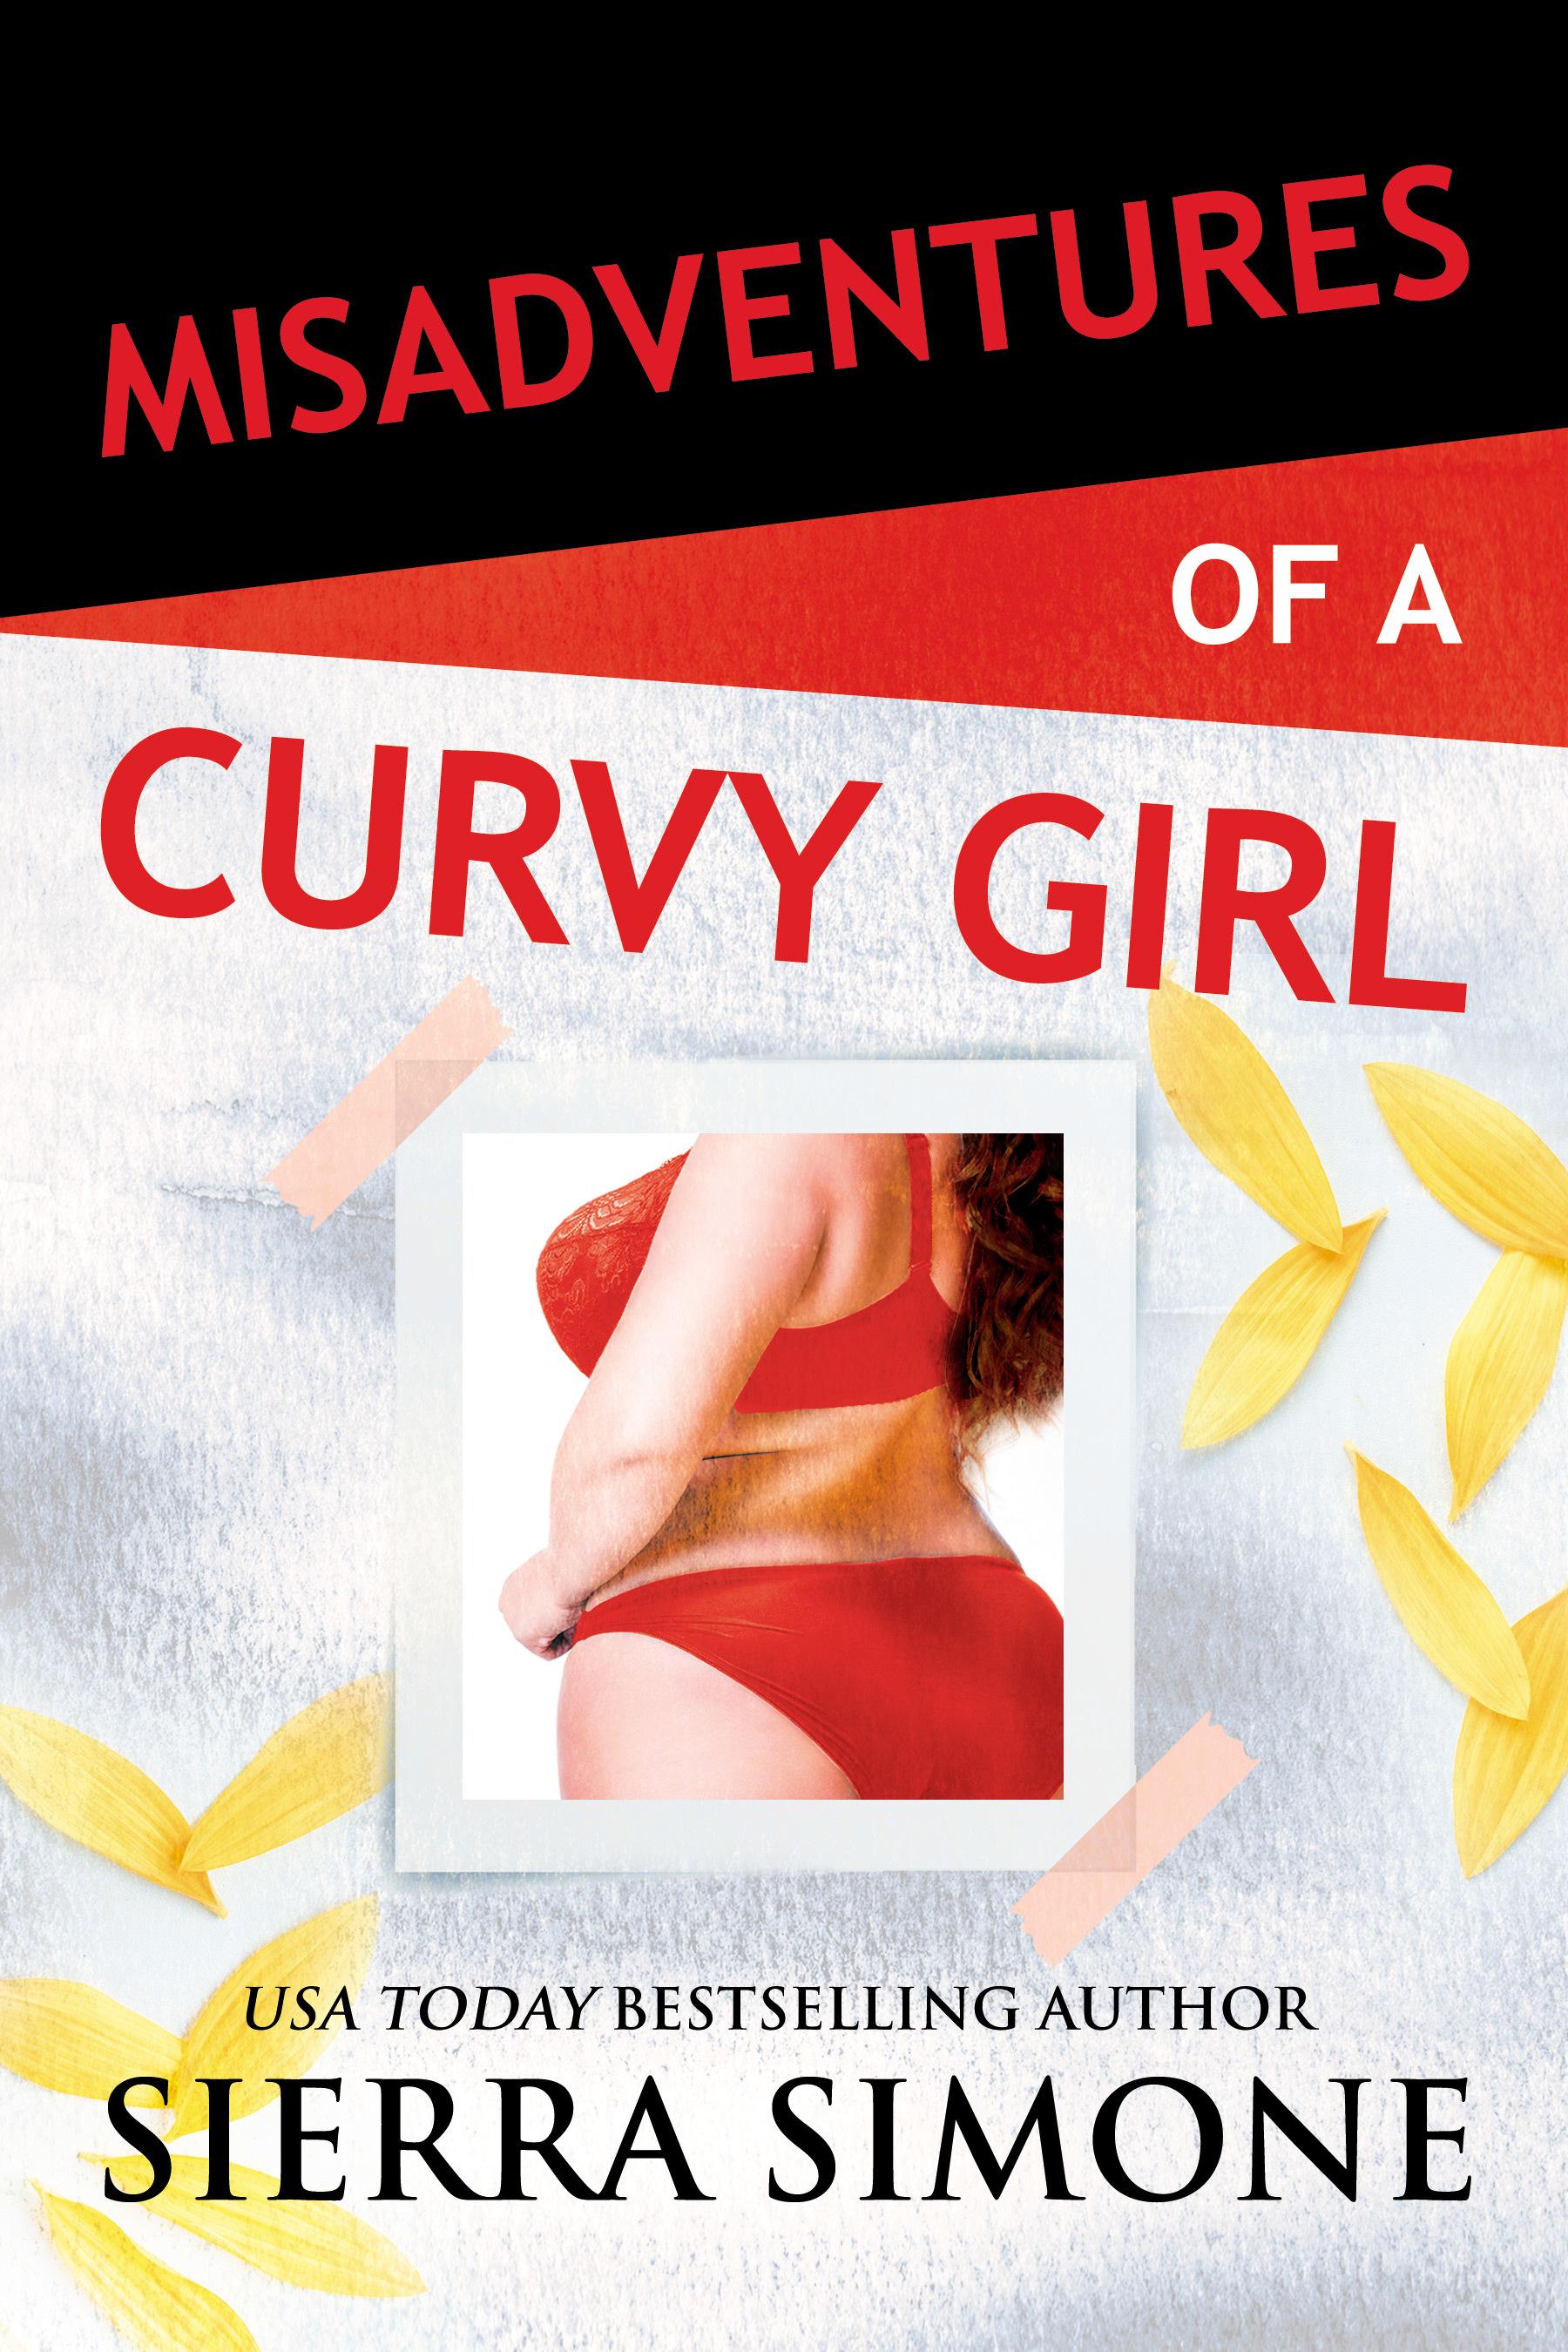 Misadventures of a Curvy Girl (Misadventures #18)